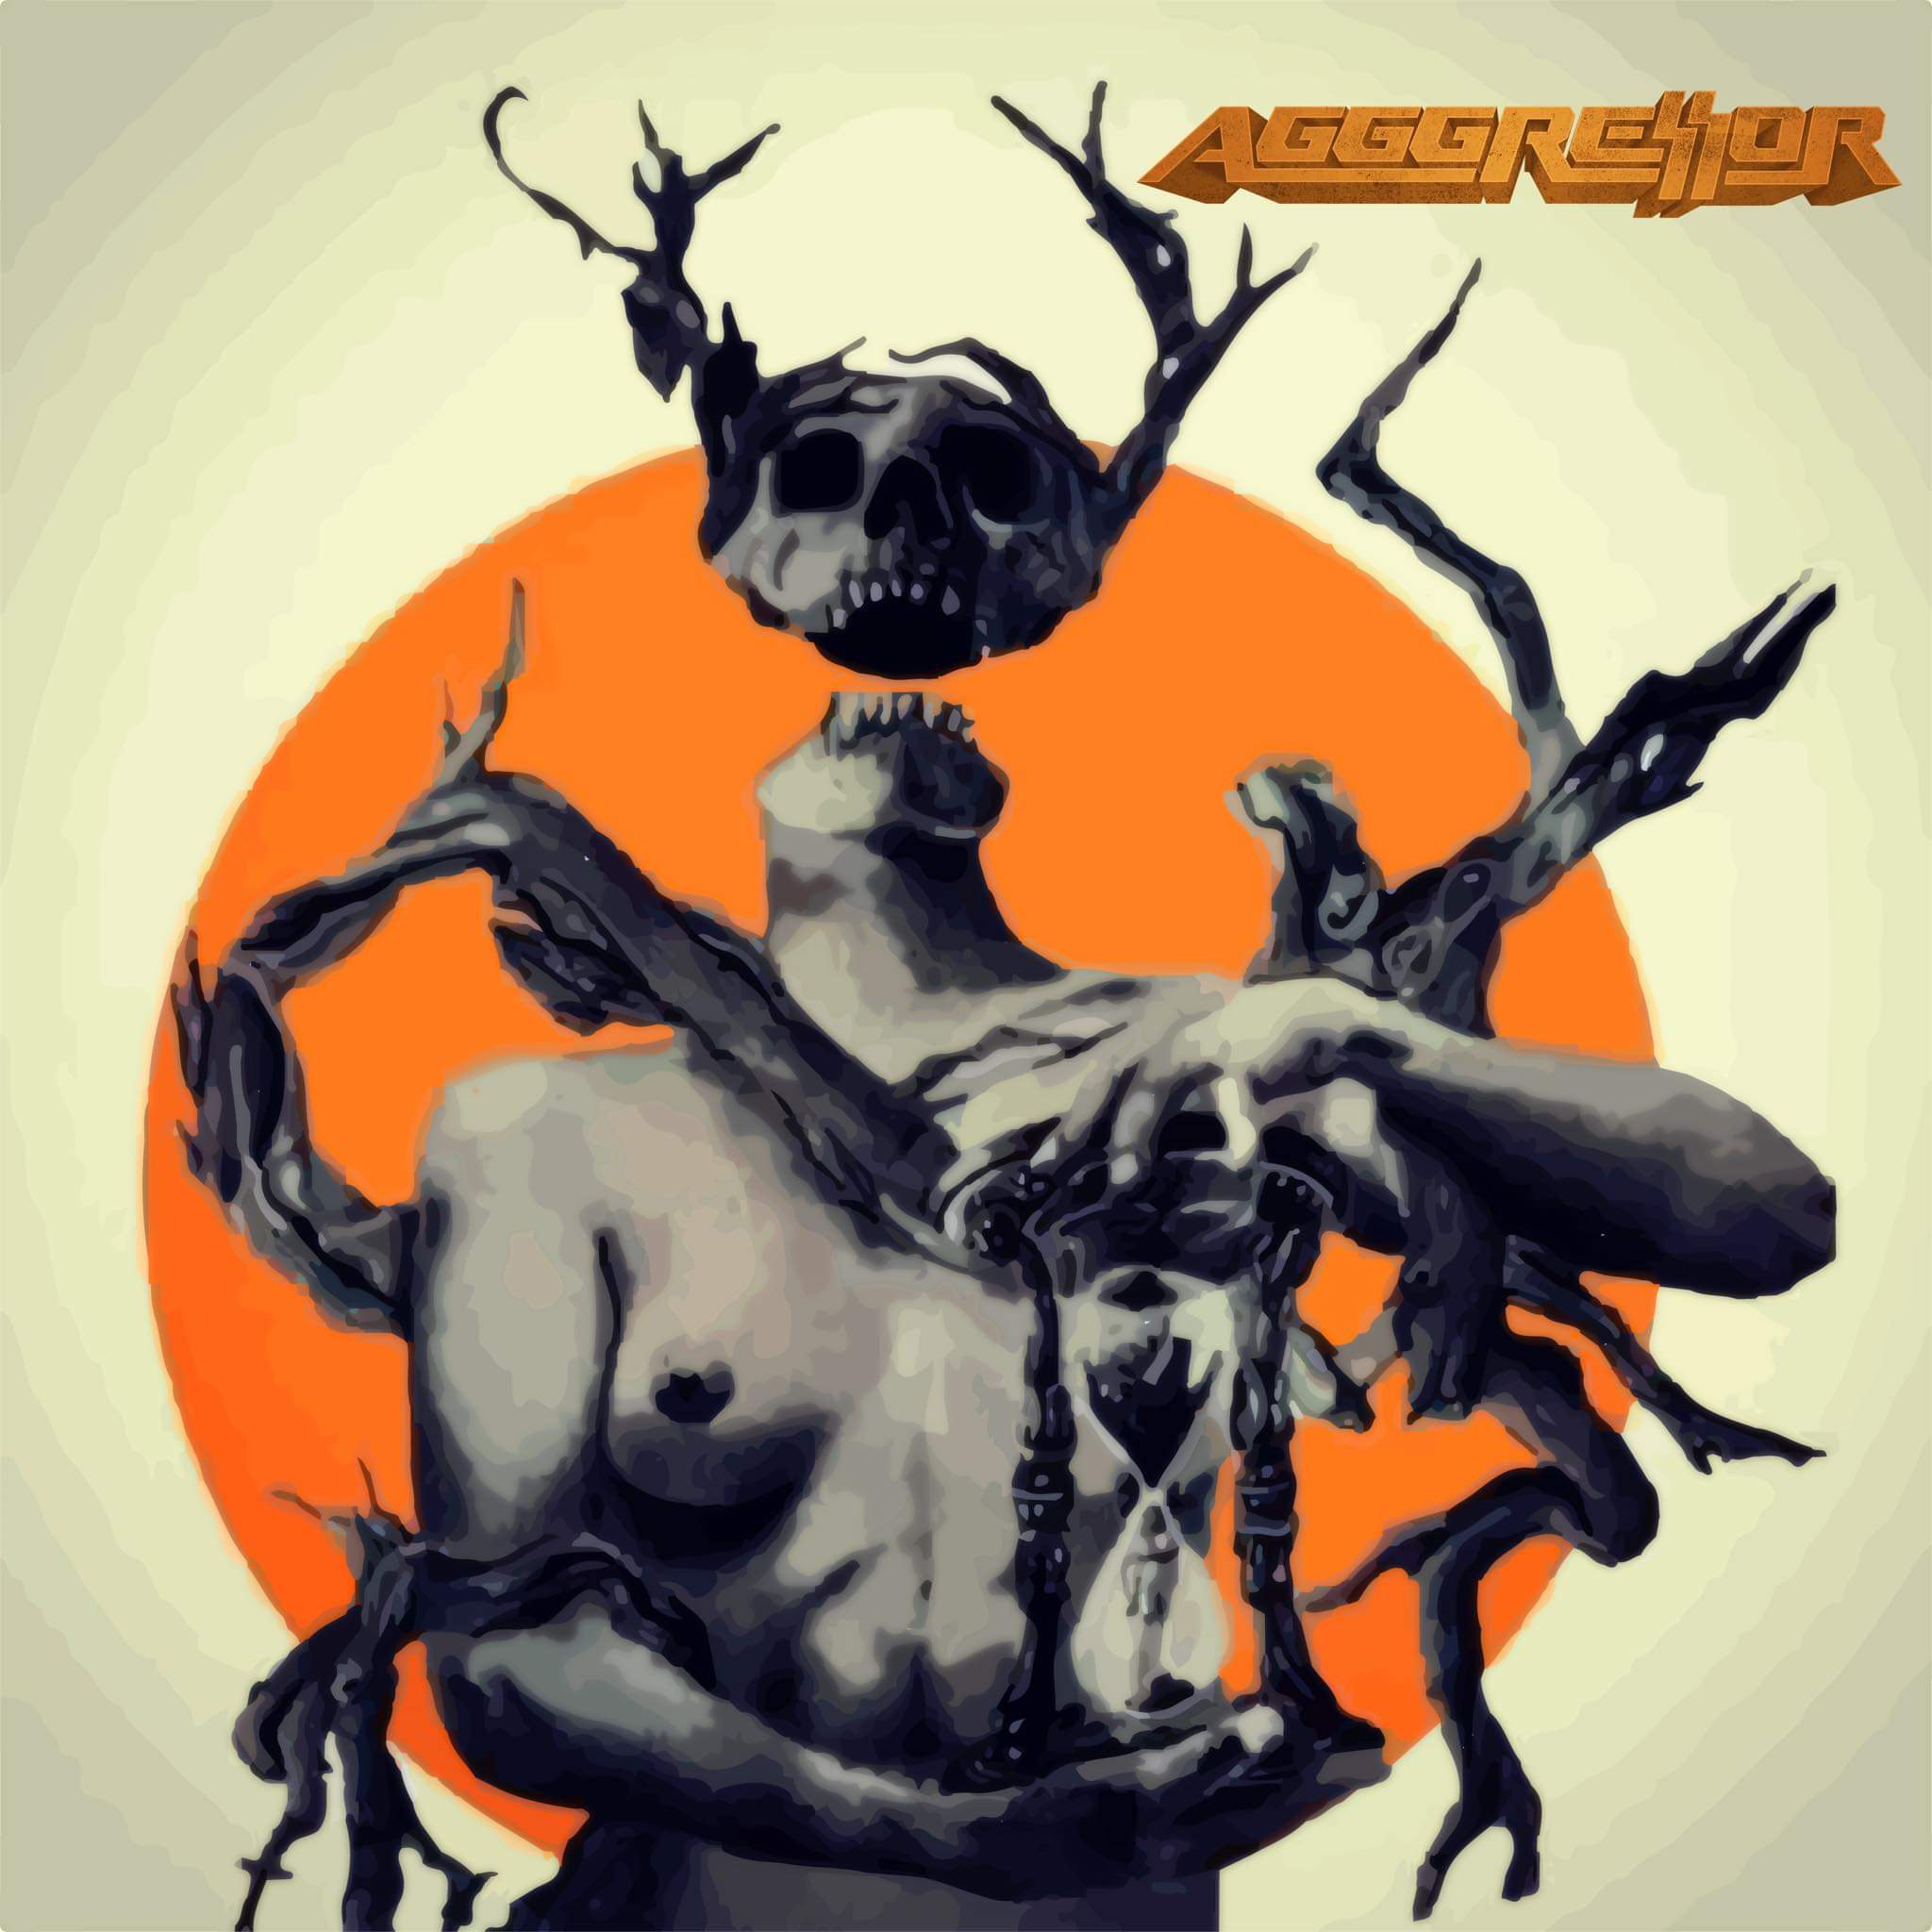 Agggressor - Lilit